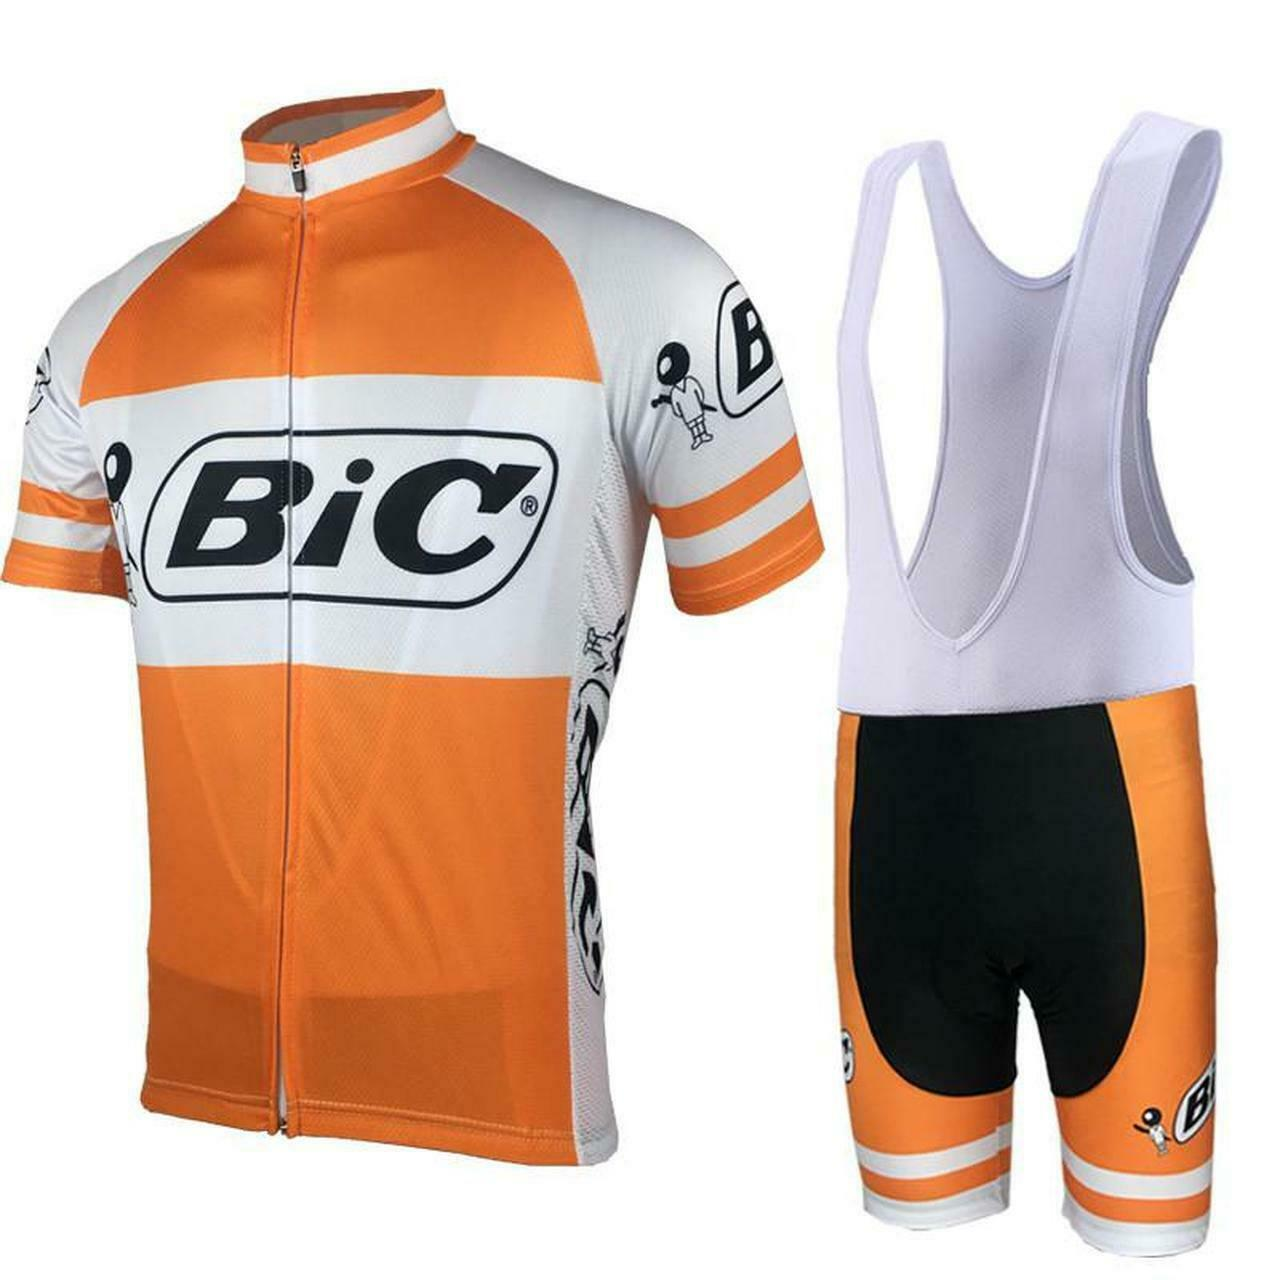 Retro  1973 Team Bic Cycling Kit  free shipping & exchanges.